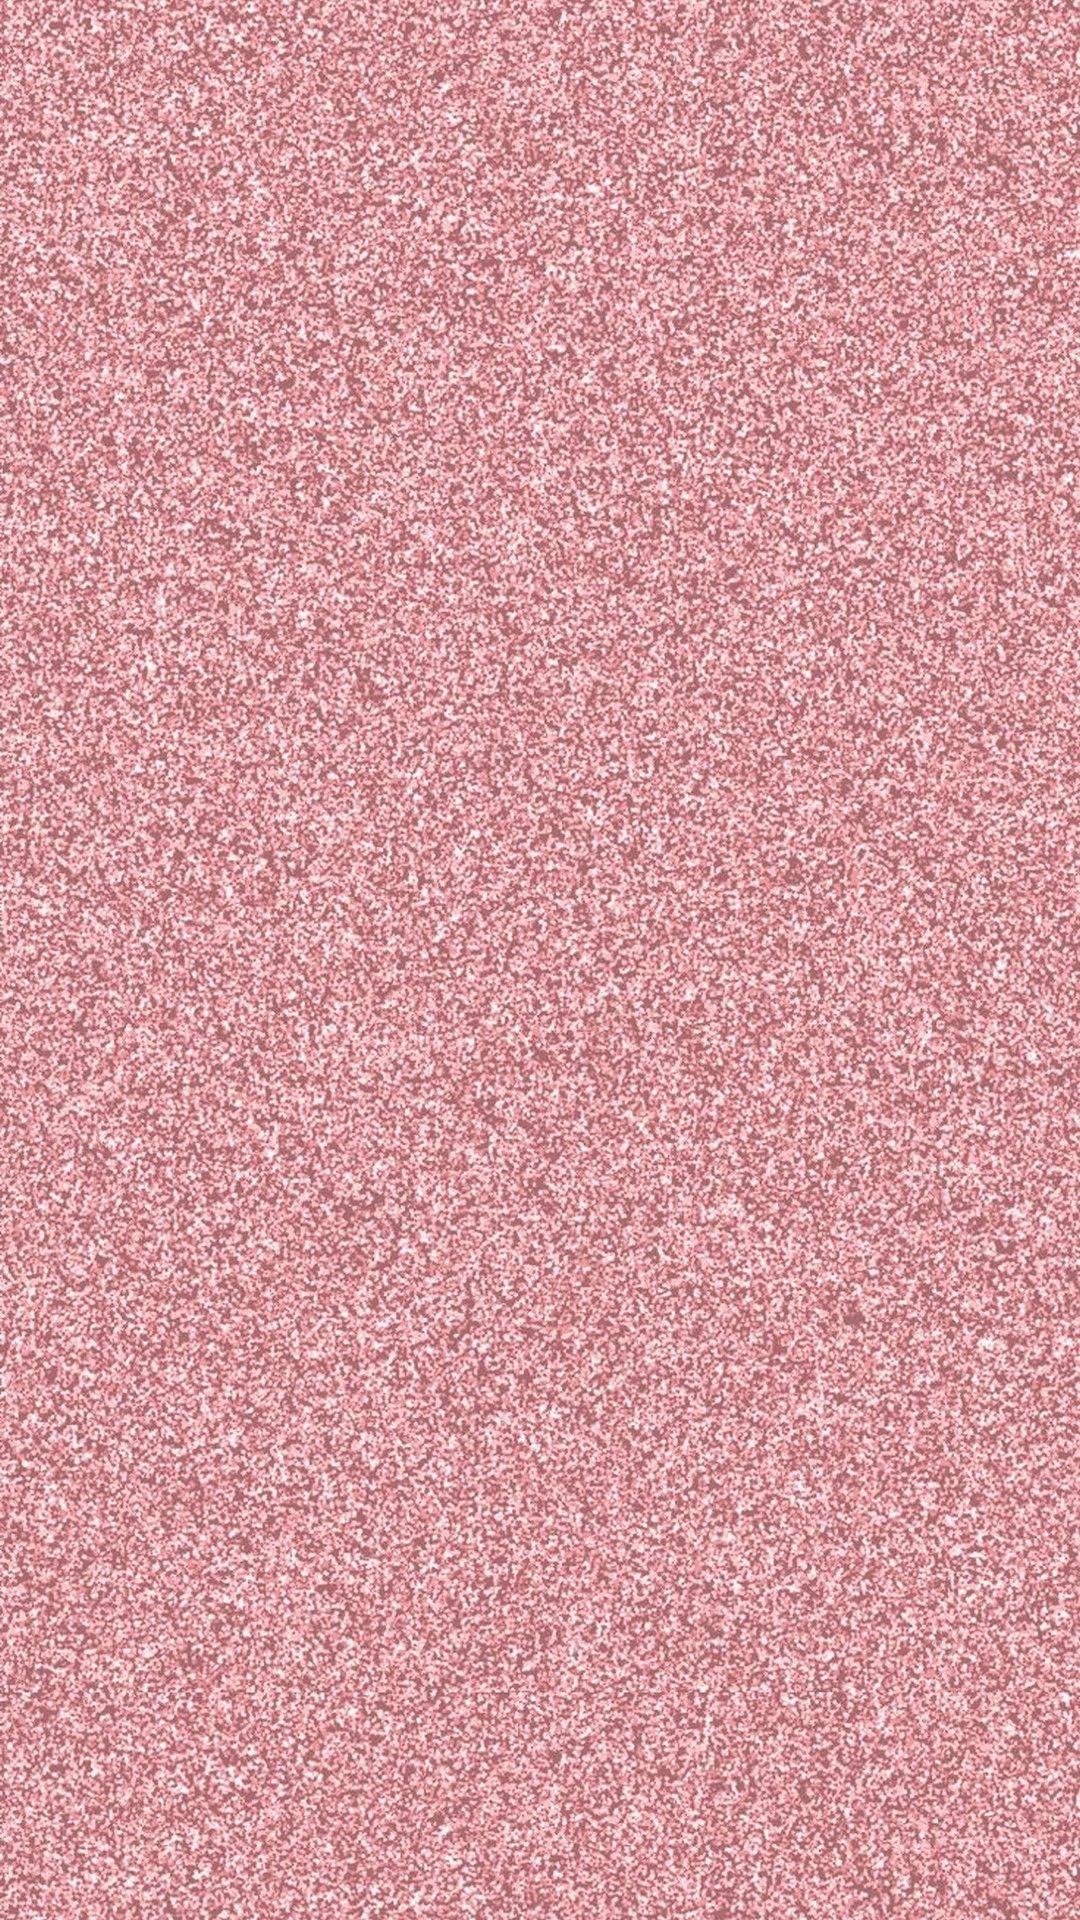 iPhone Wallpaper Rose Gold Glitter | iPhoneWallpapers | Pink glitter wallpaper, Glitter ...